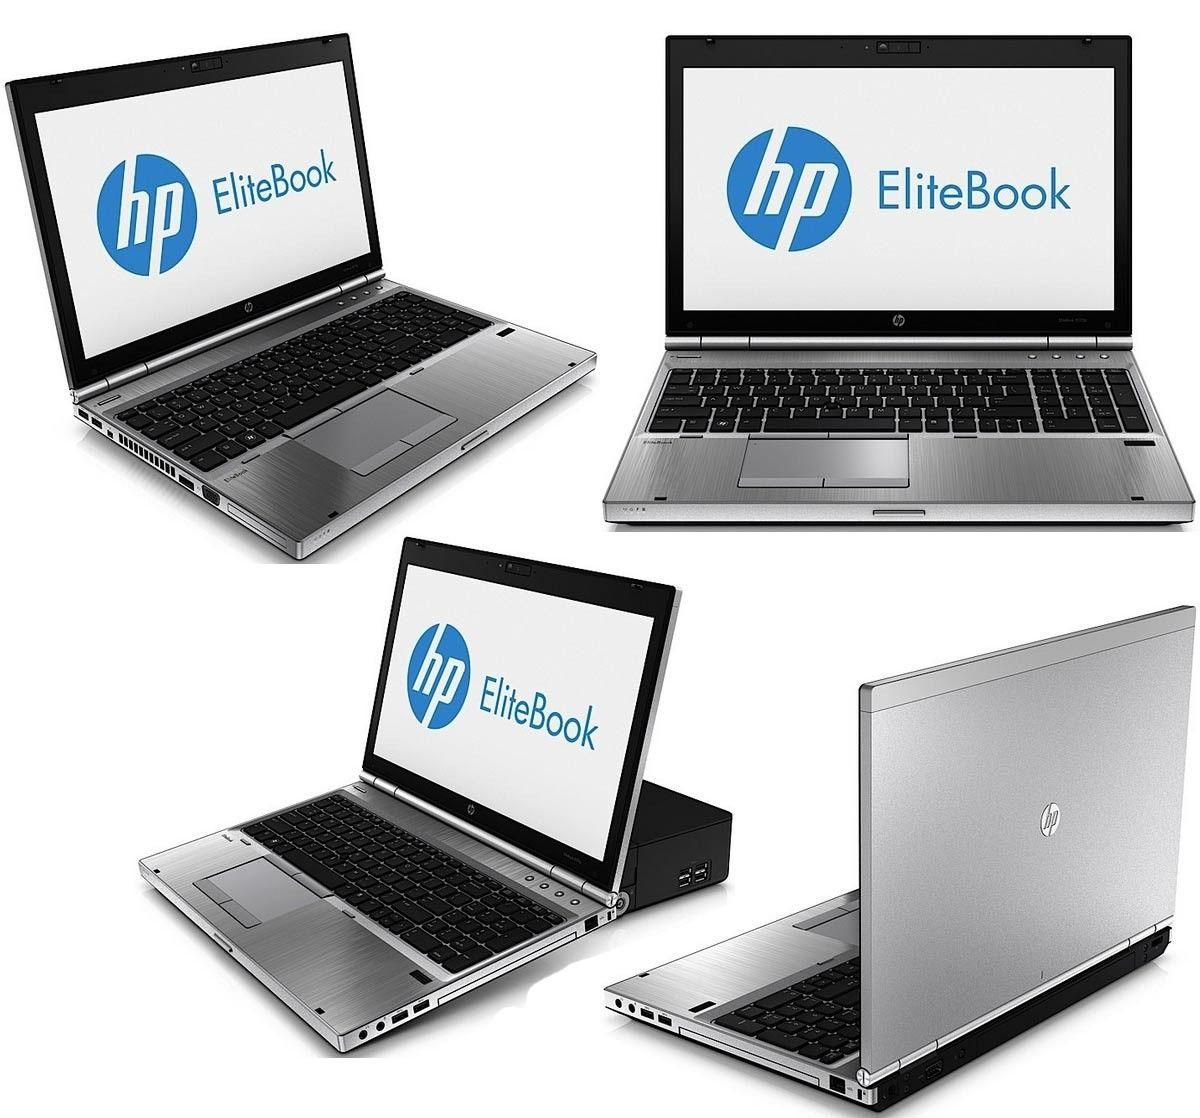 Sjekk prisen! HP Elitebook 8570p 15,6